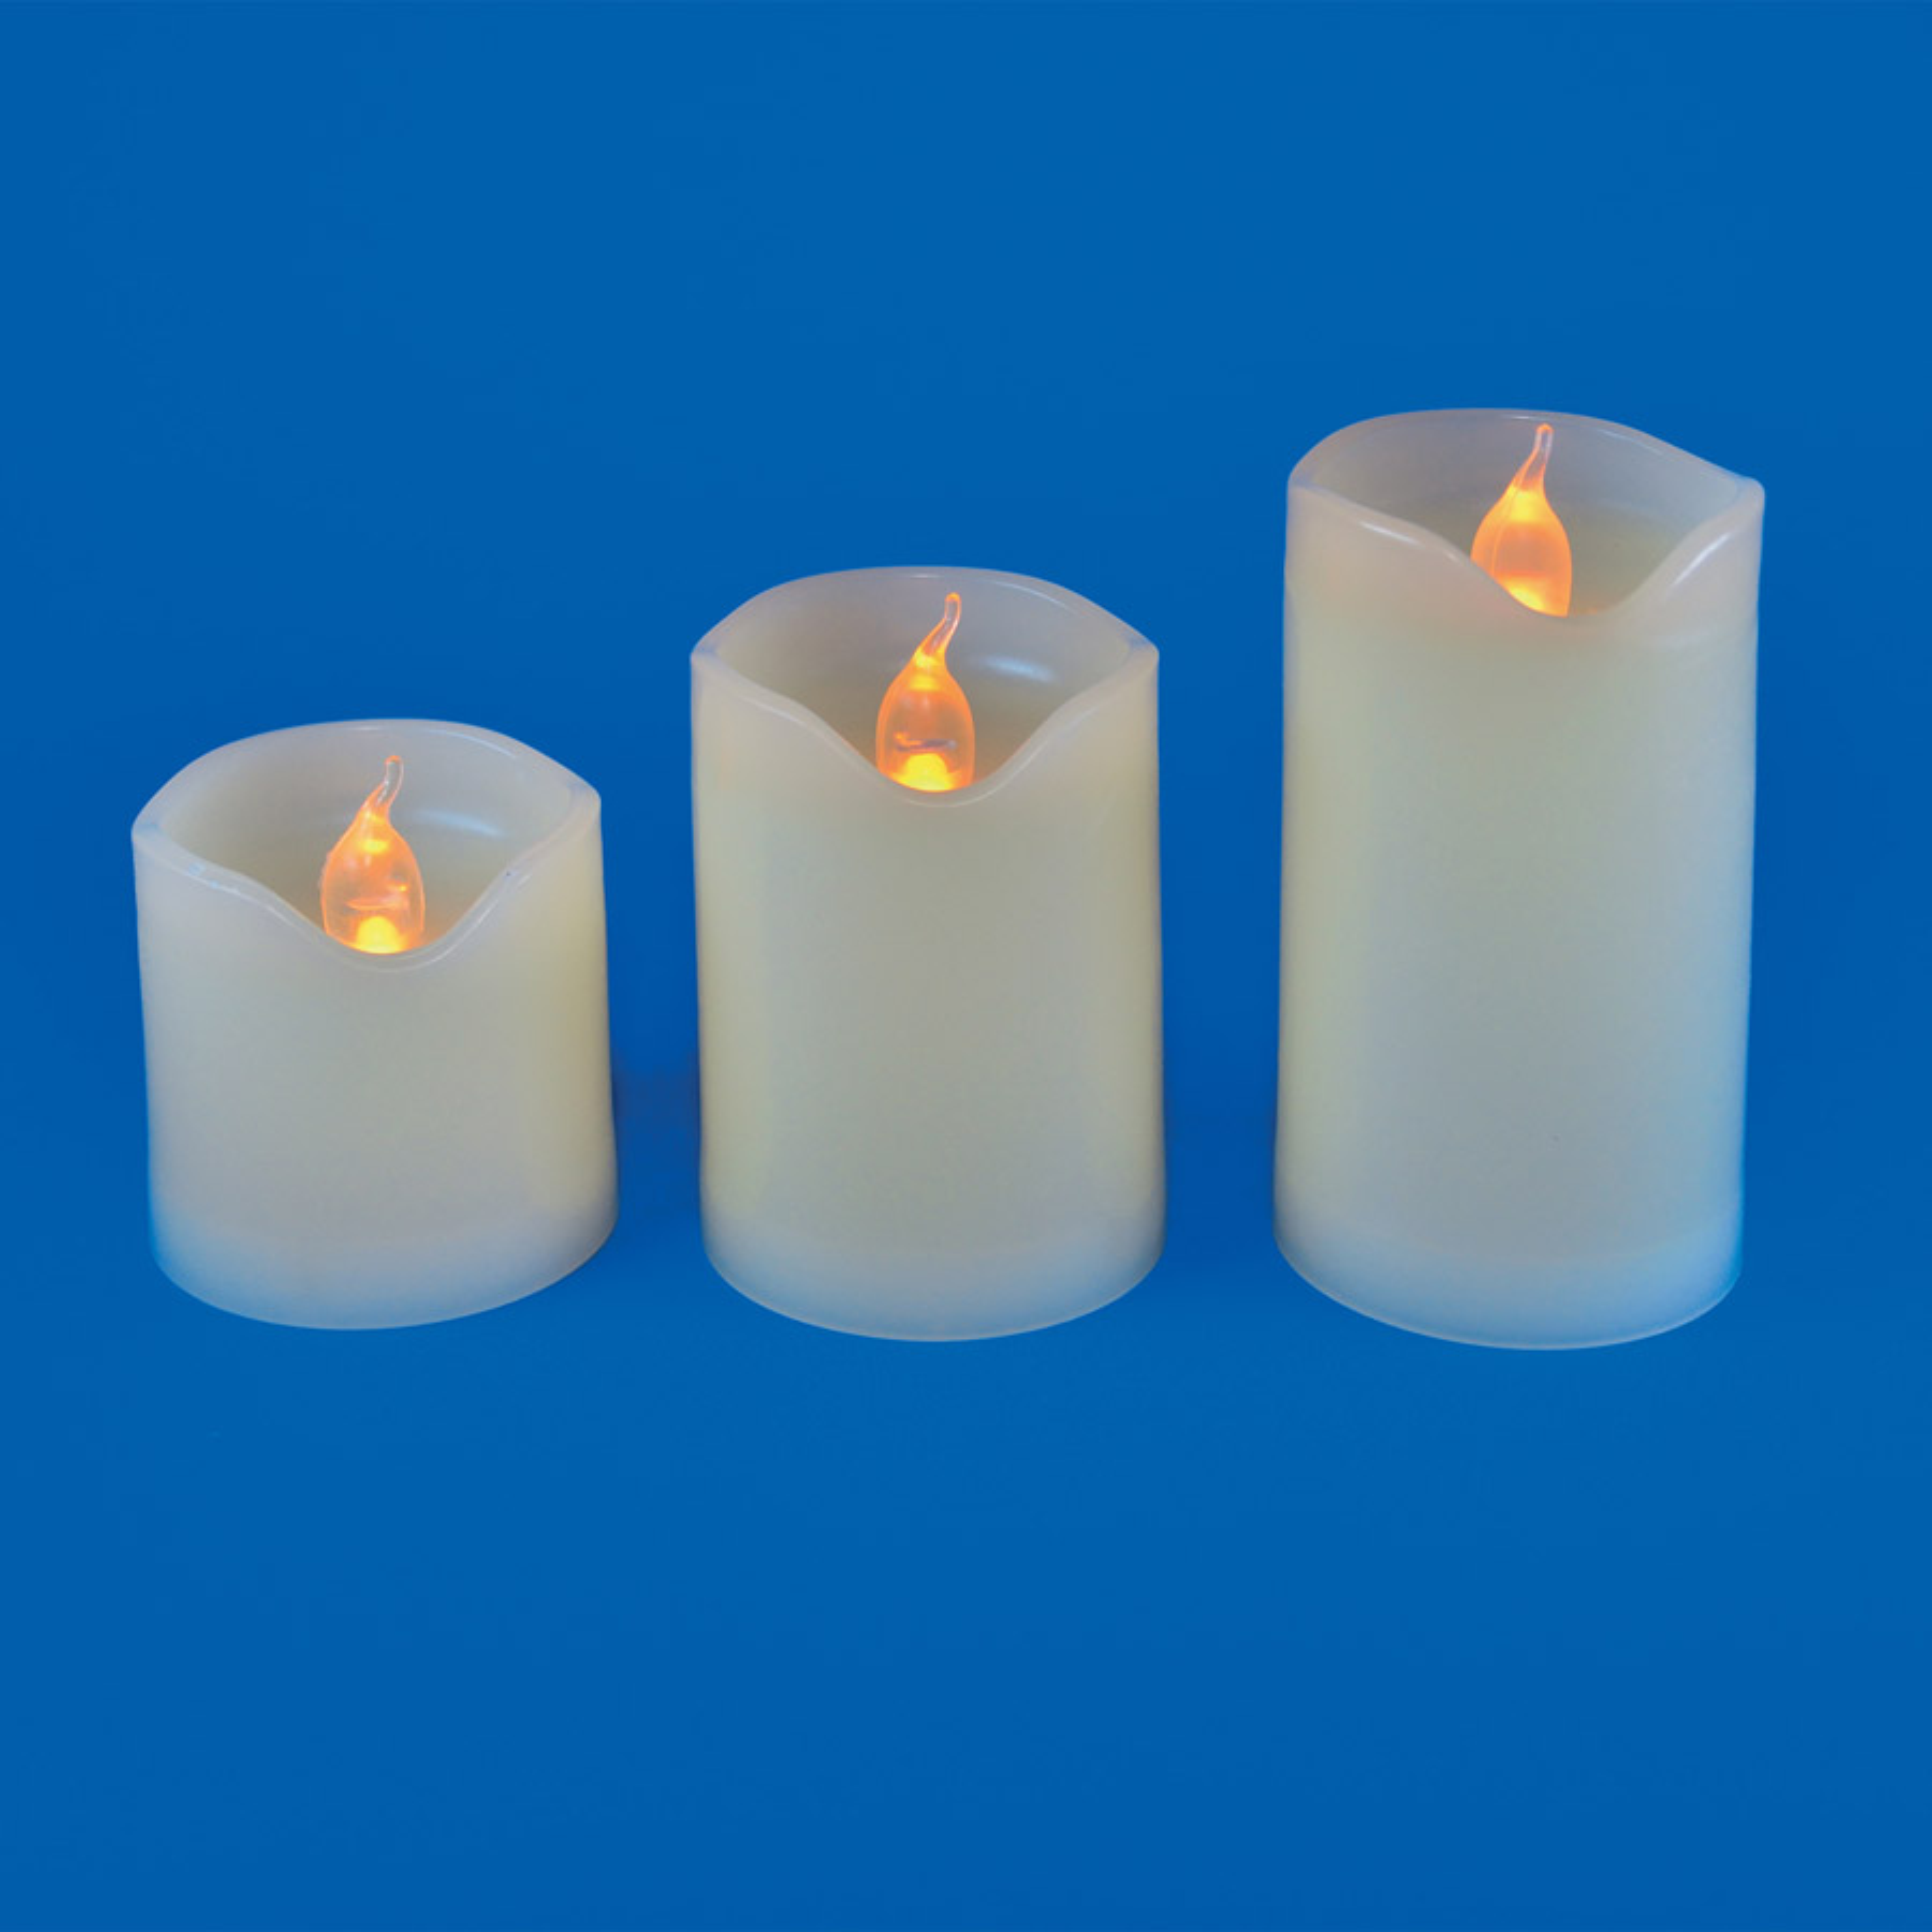 ULD-F060 WARM WHITE CANDLE SET3